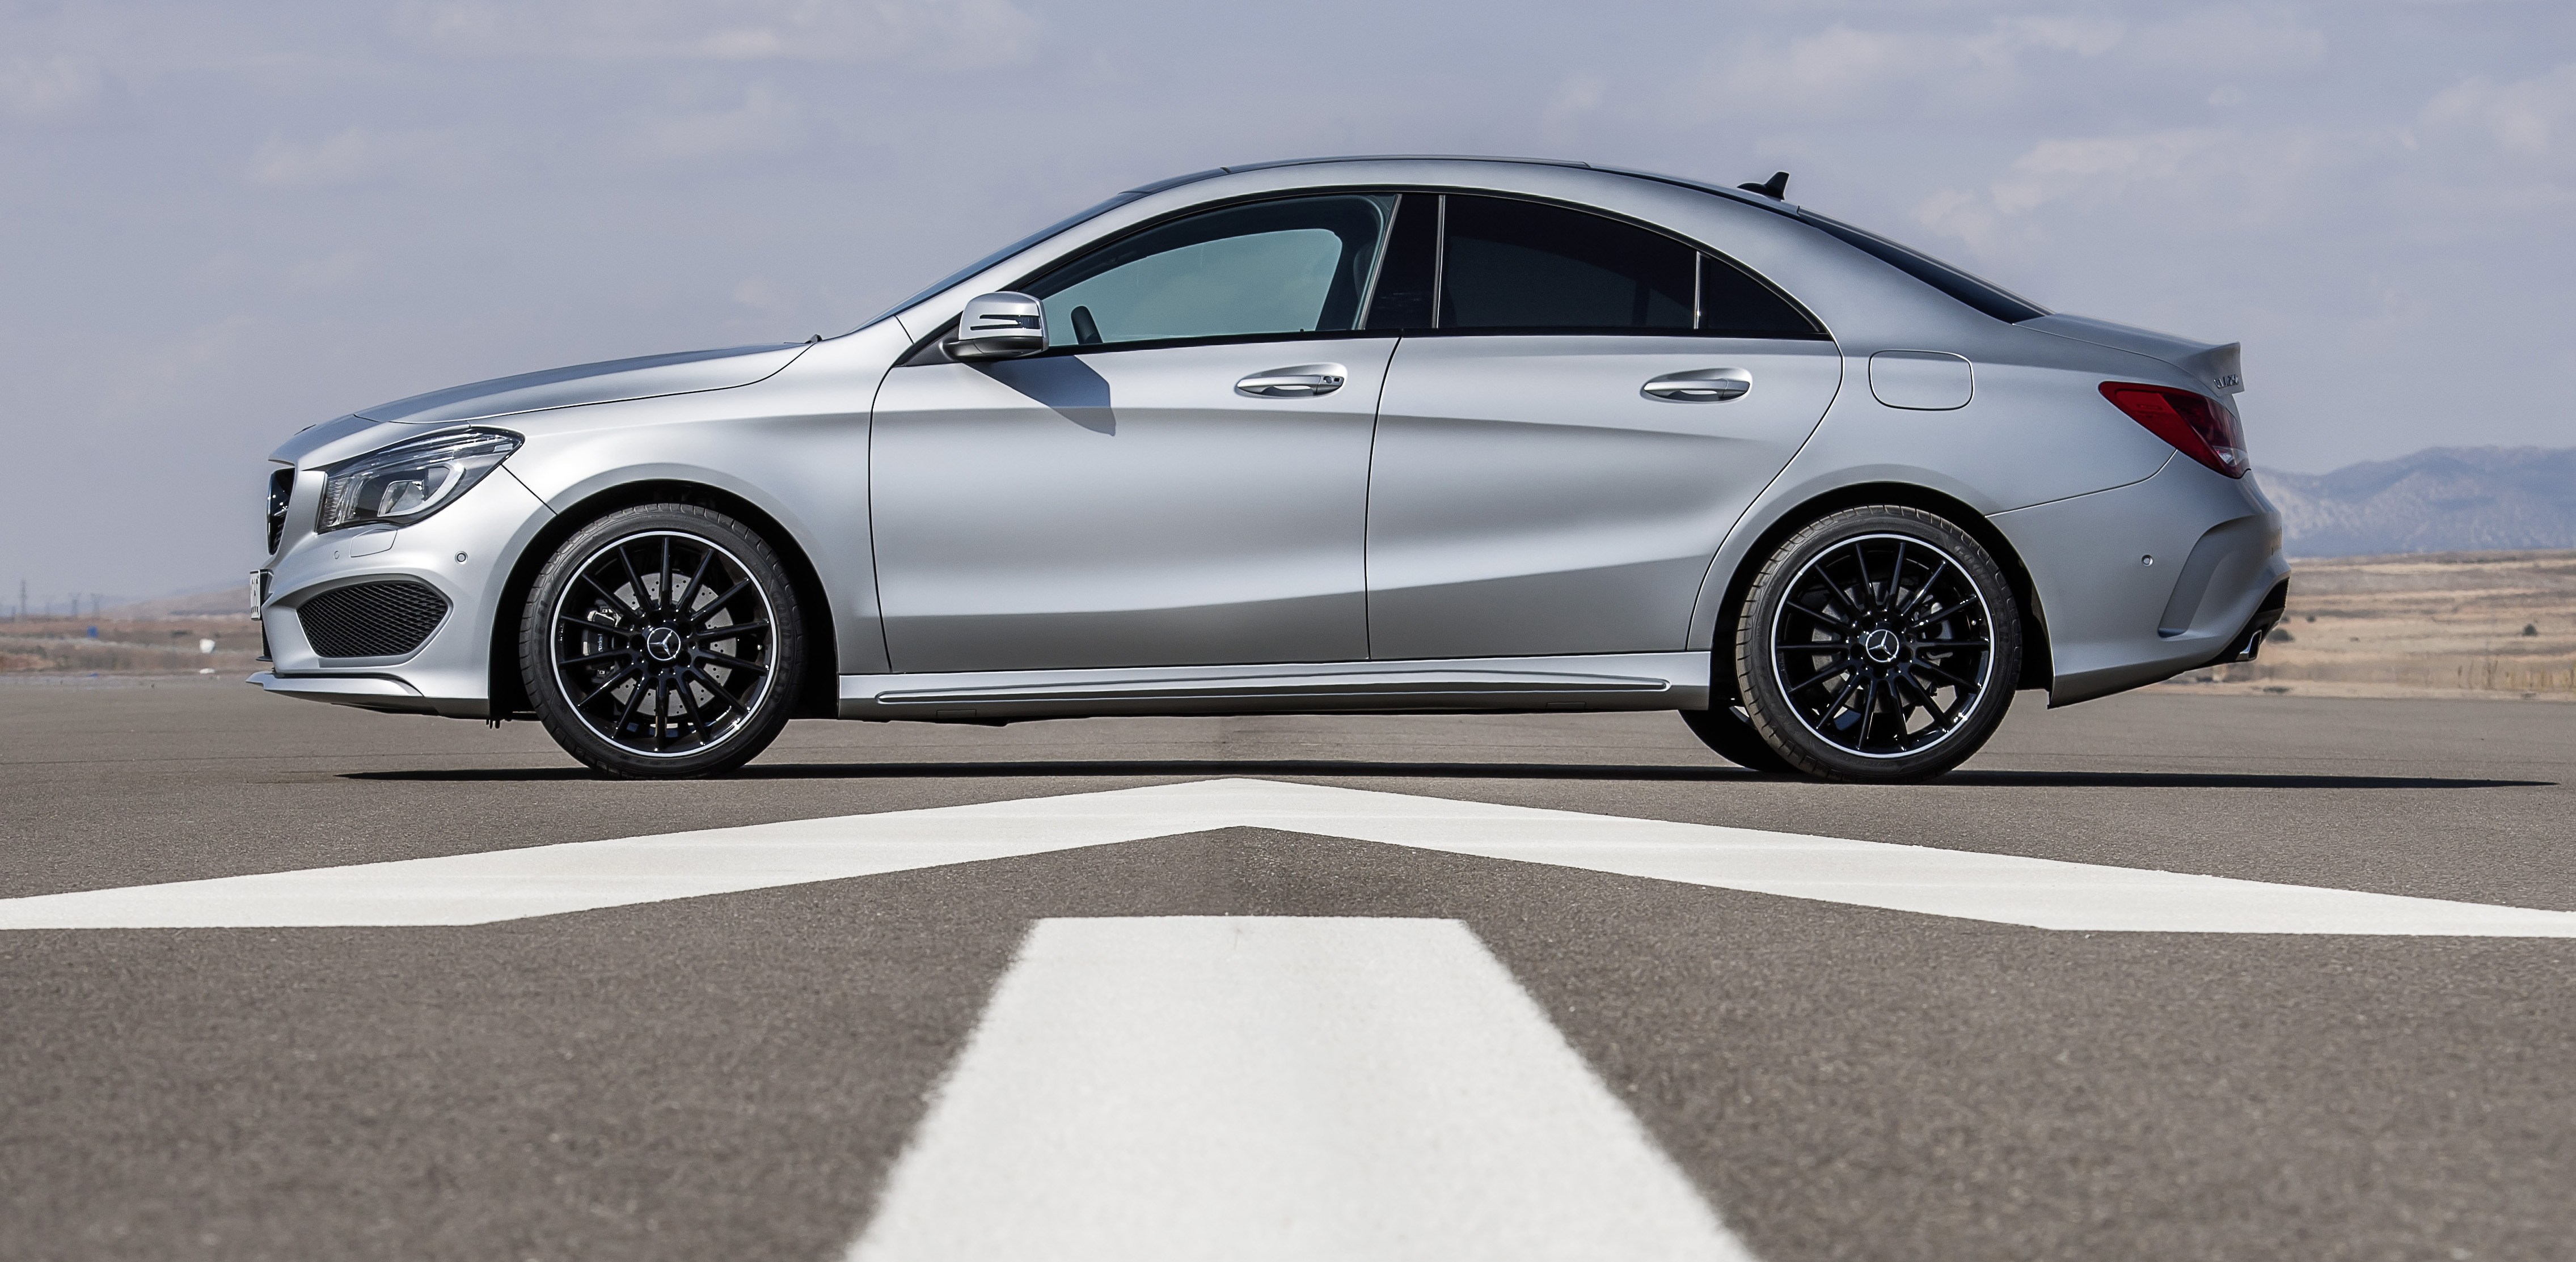 New mercedes benz cla class makes its debut image 149610 for Mercedes benz cla vs c class